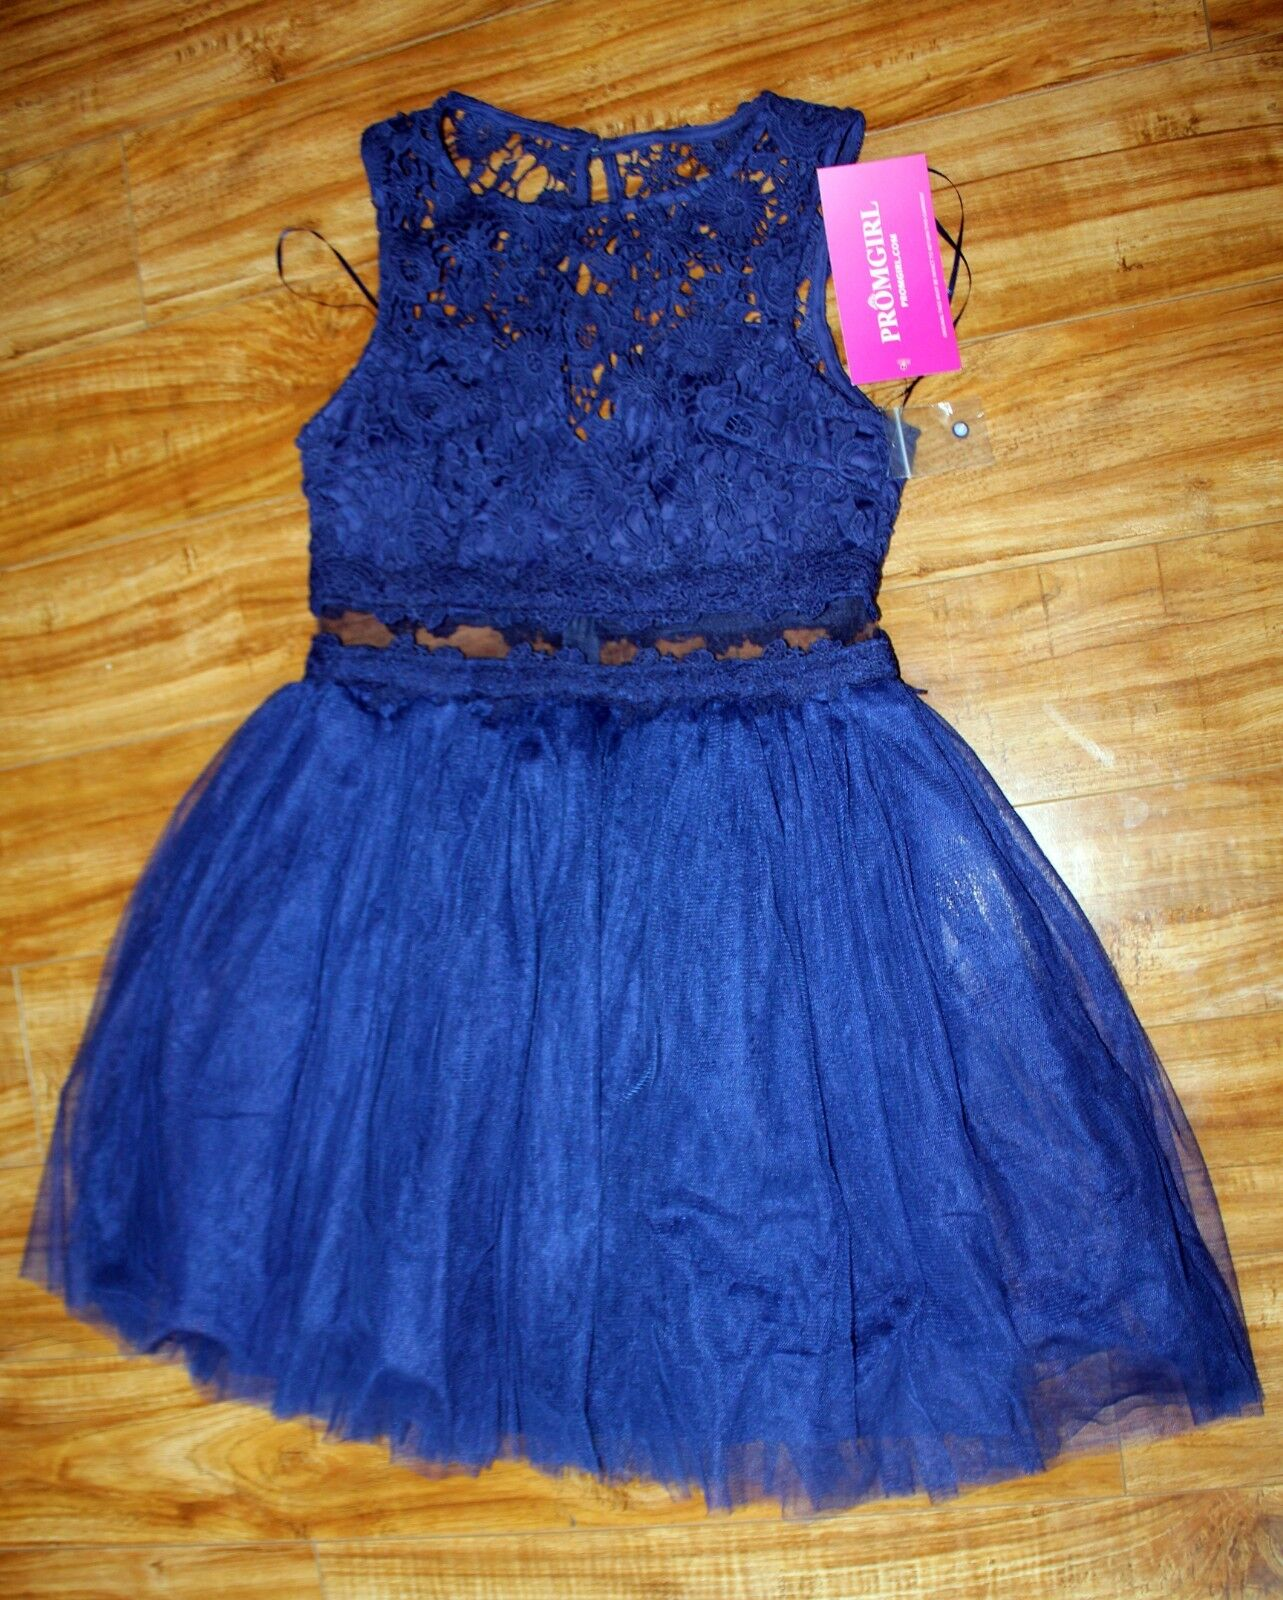 Brand New Formal/Prom Dress! Beautiful Dress - Never Been Worn-Tags Still On!